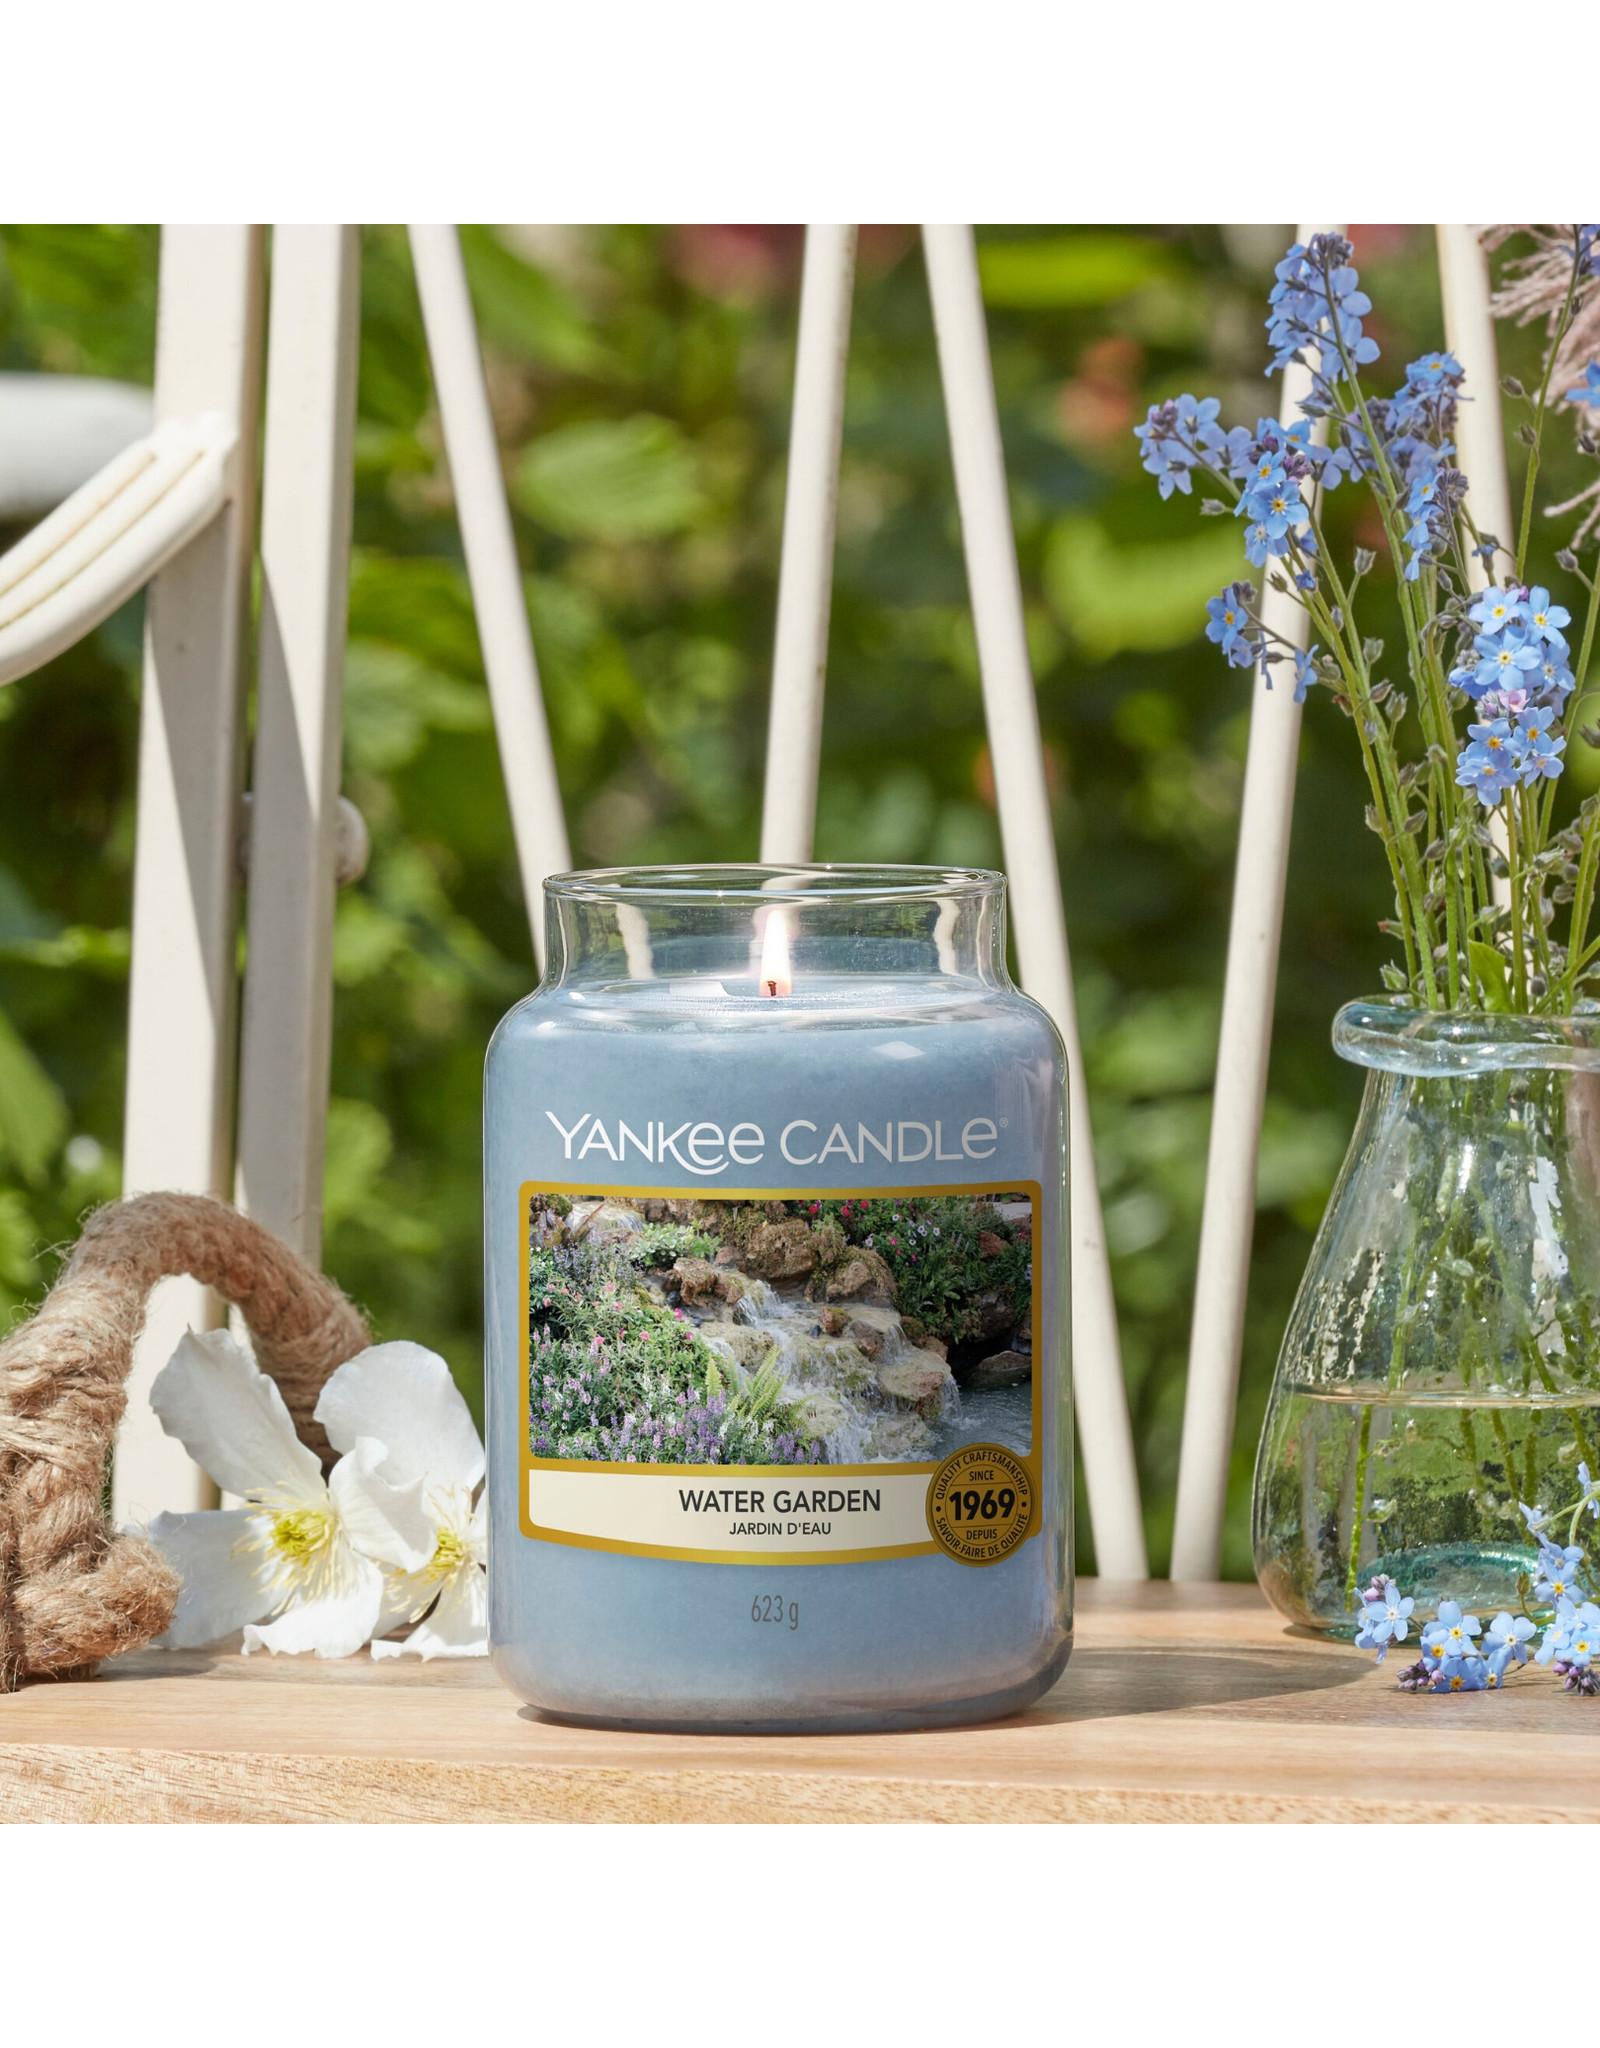 Yankee Candle Water Garden  - Large Jar